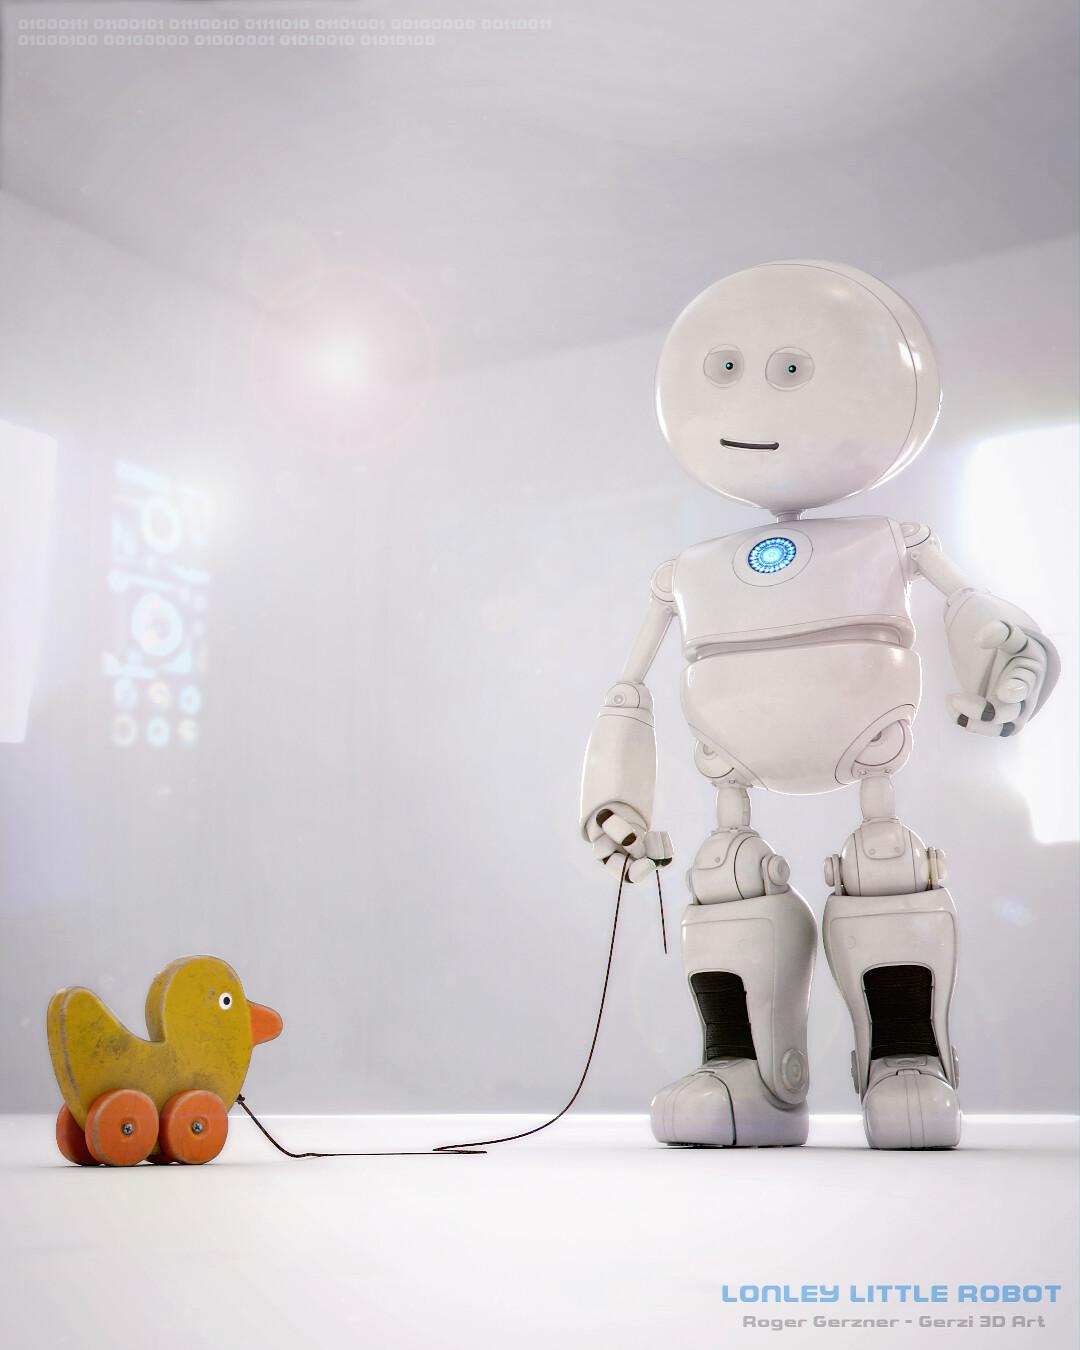 Roger gerzner lonley little robot